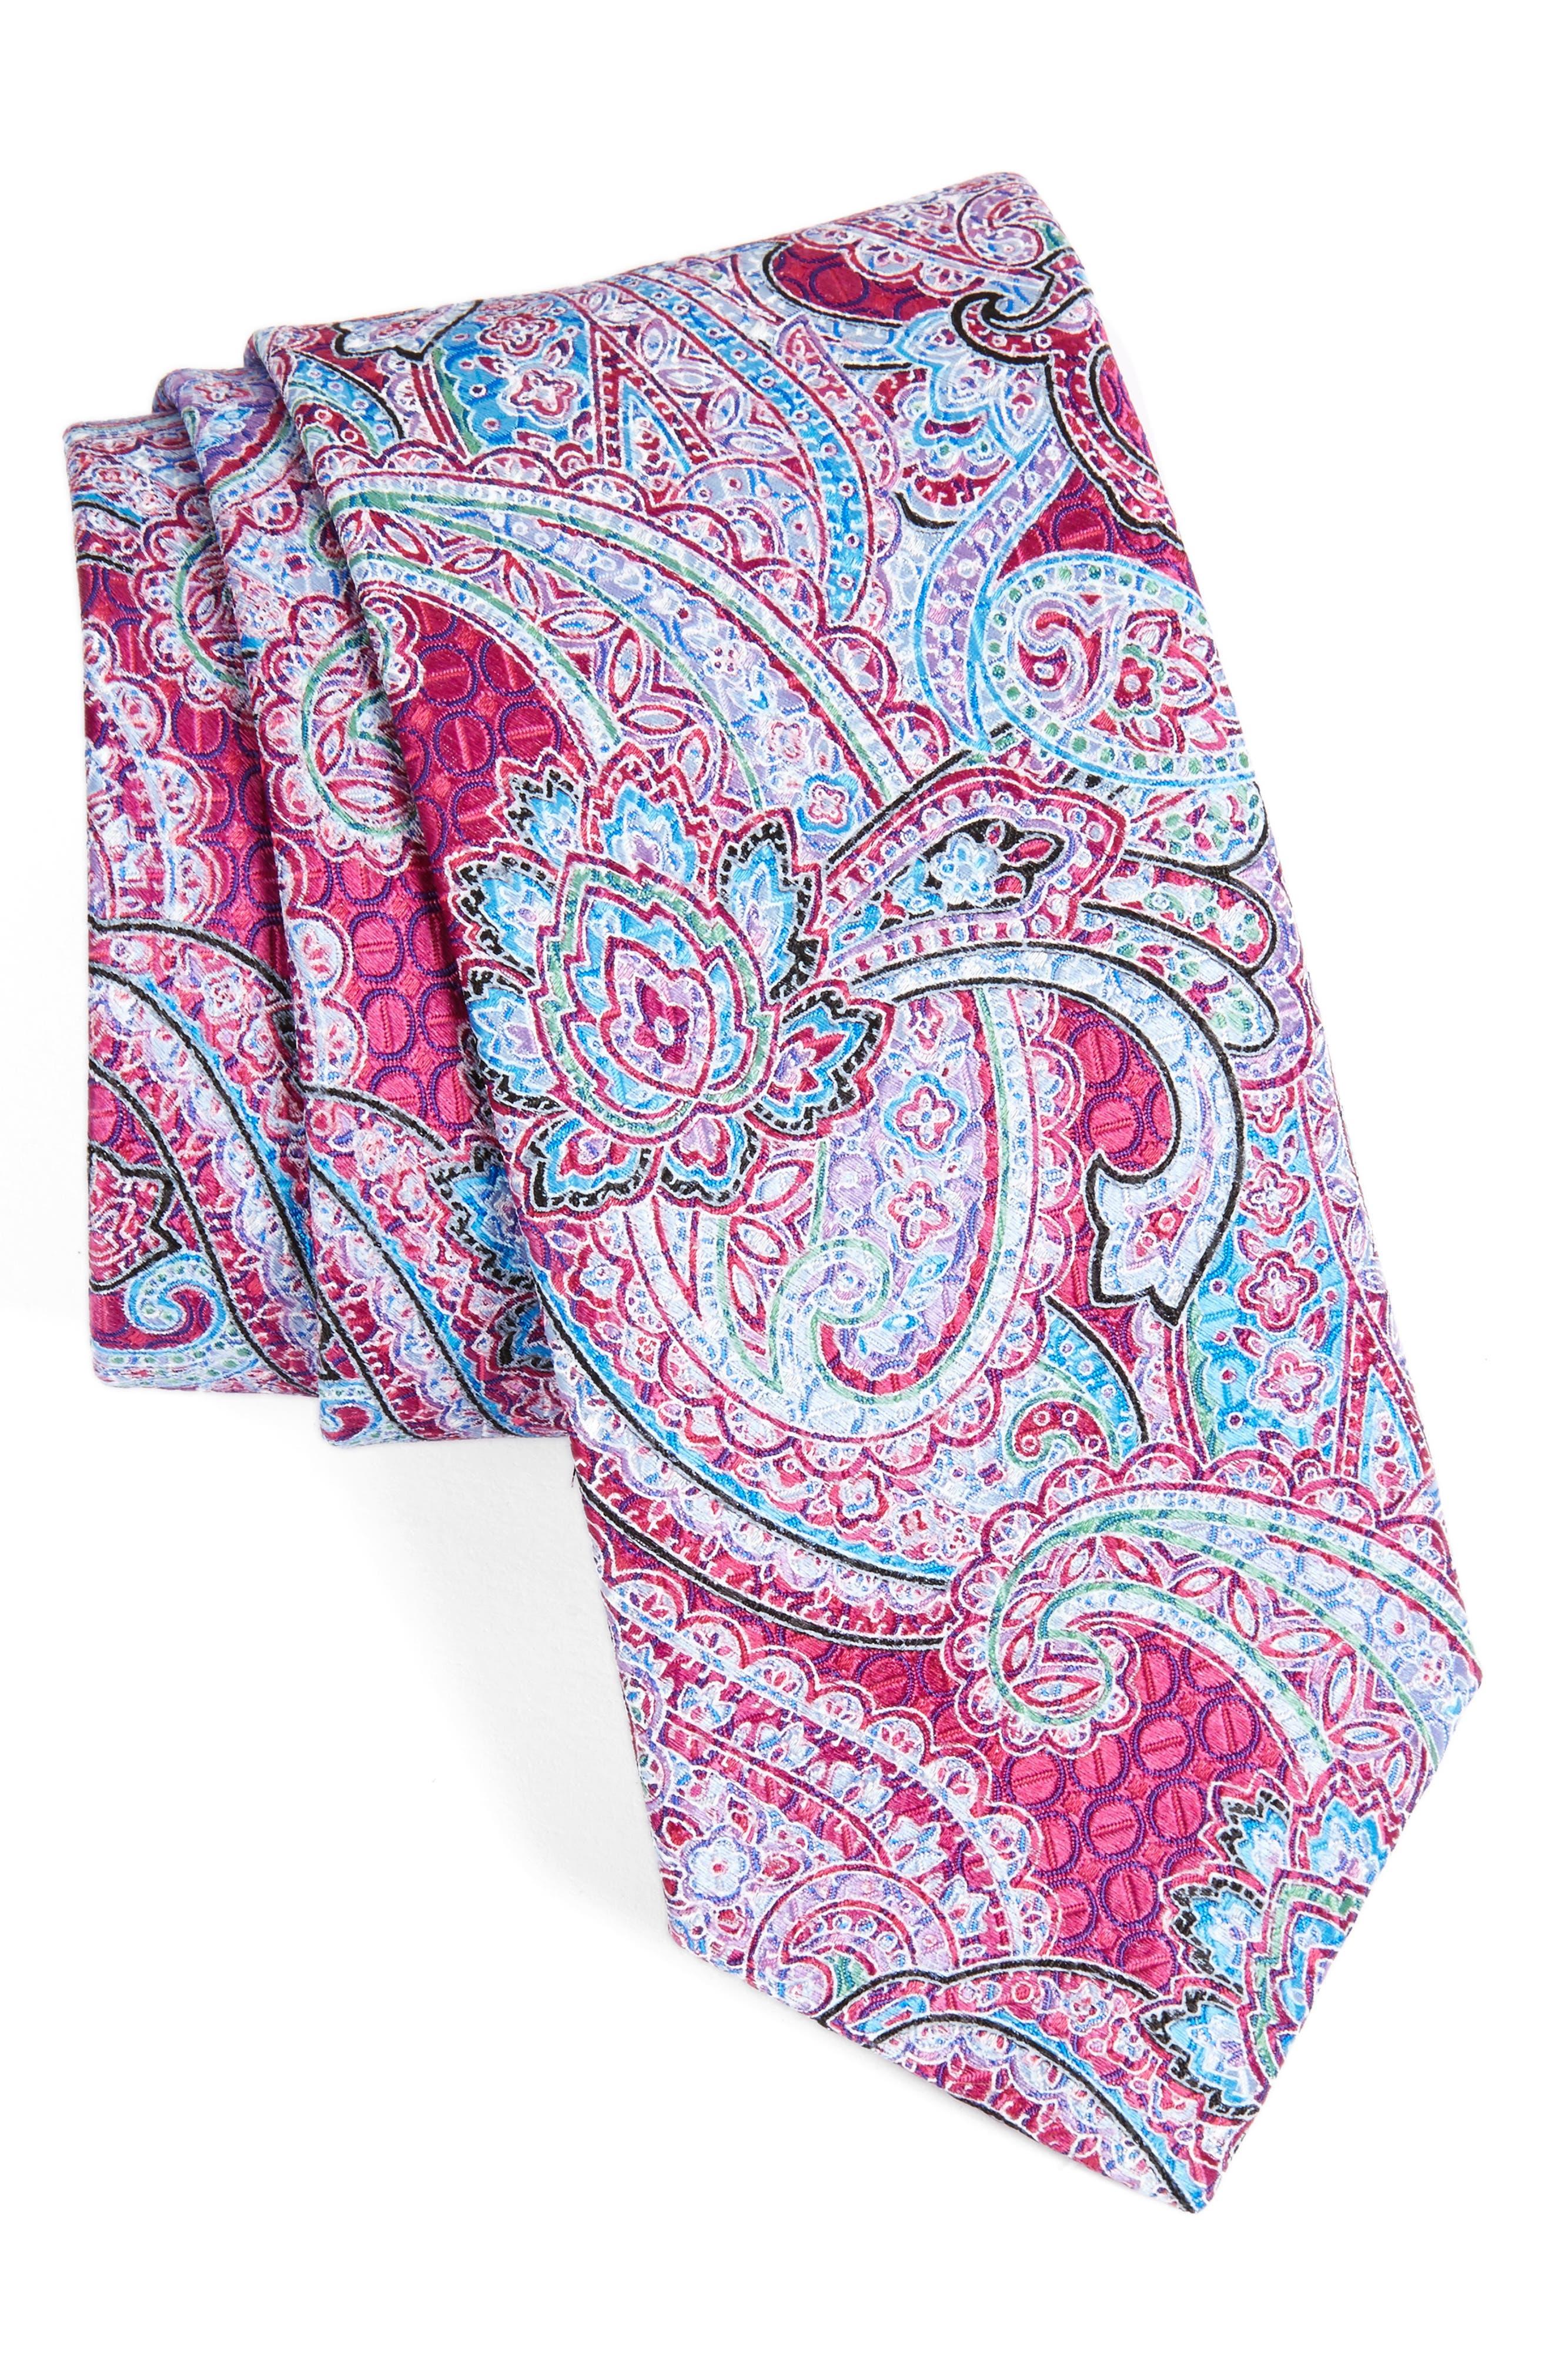 Alternate Image 1 Selected - John W. Nordstrom® Paisley Silk Tie